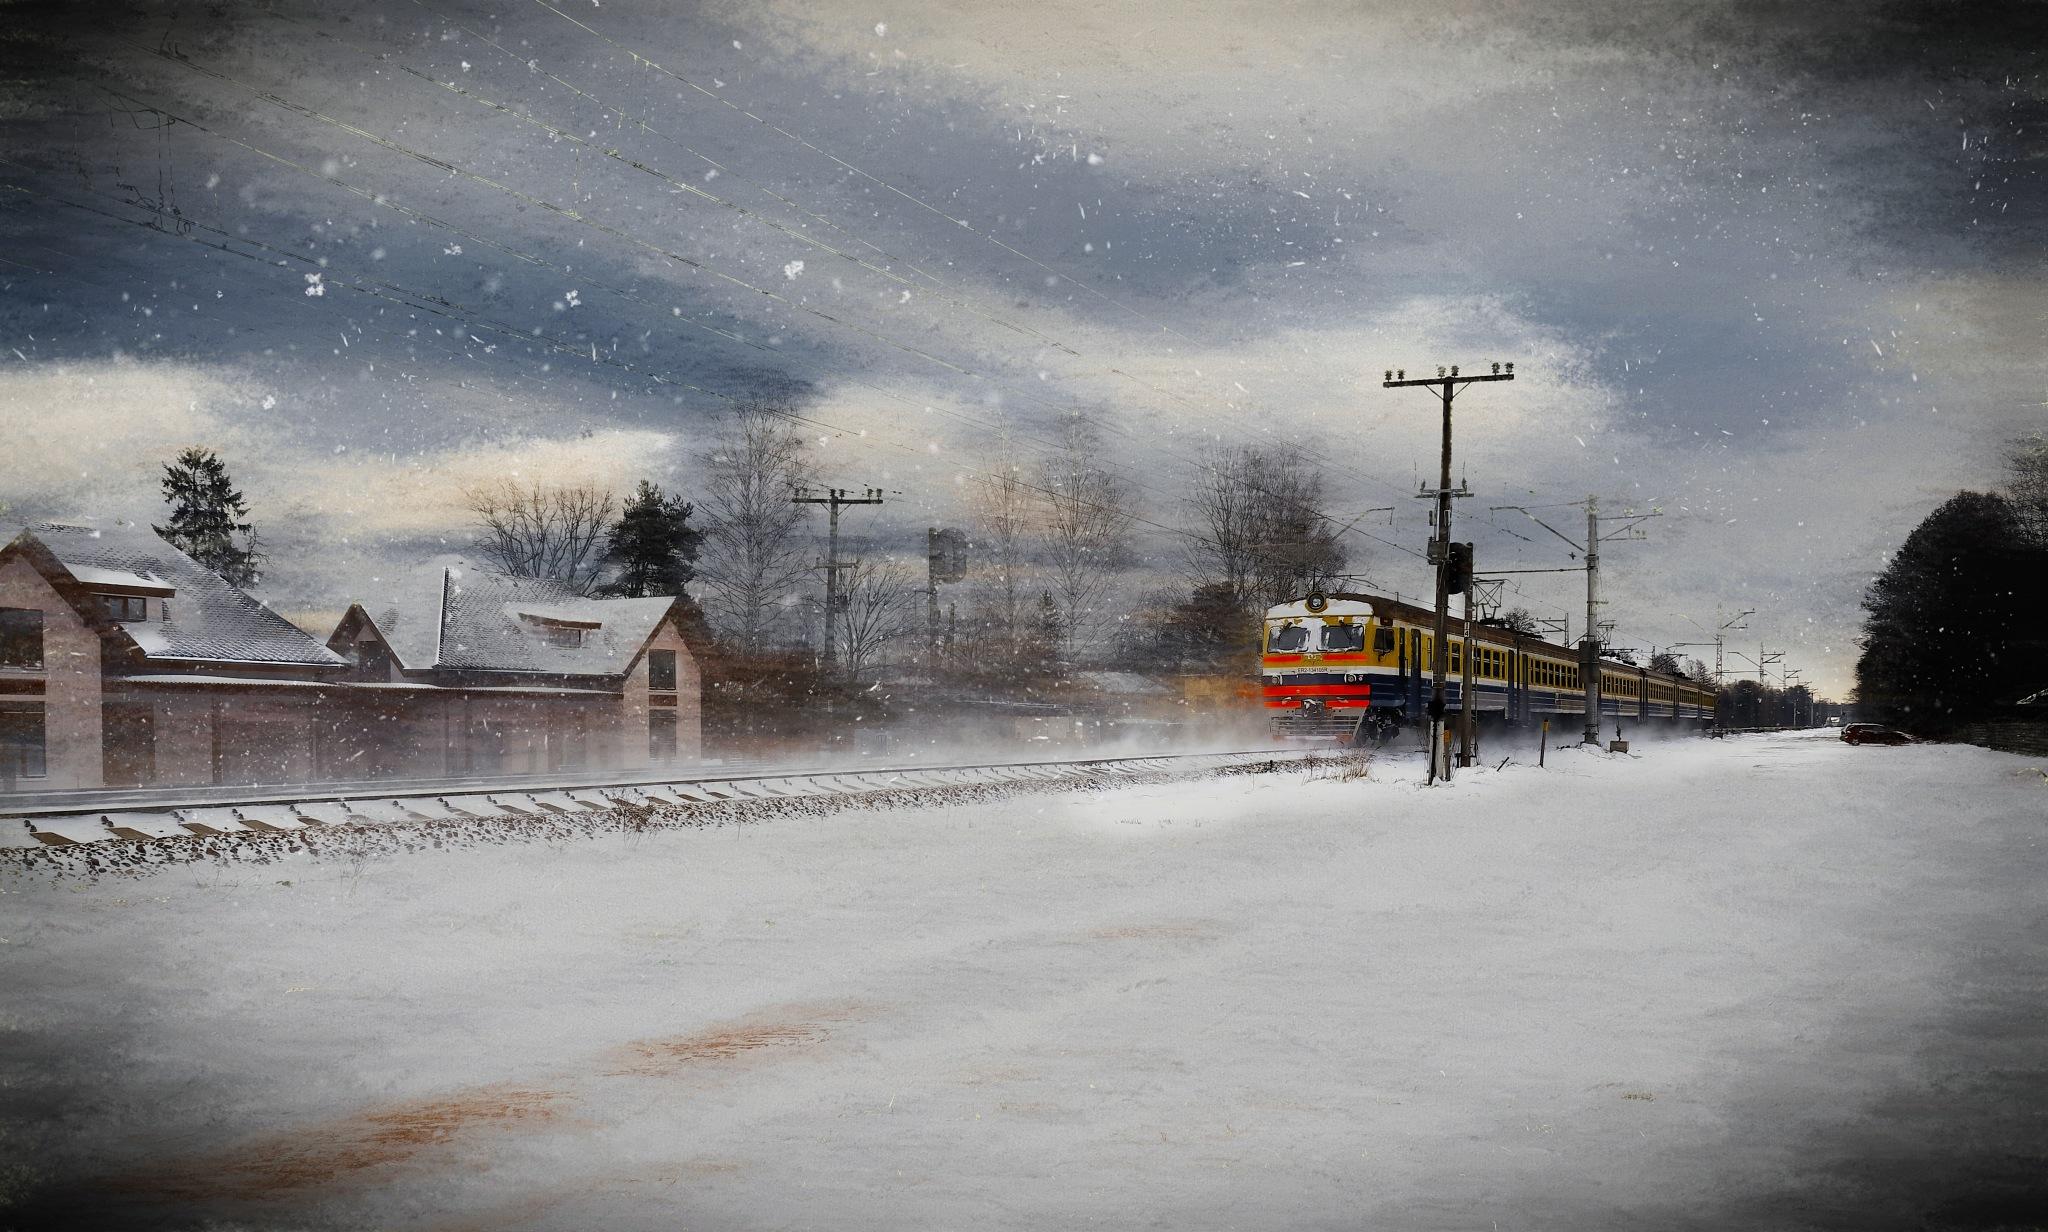 Snowy Train...Jurmala,Latvia  by Aleksandrs Drozdovs